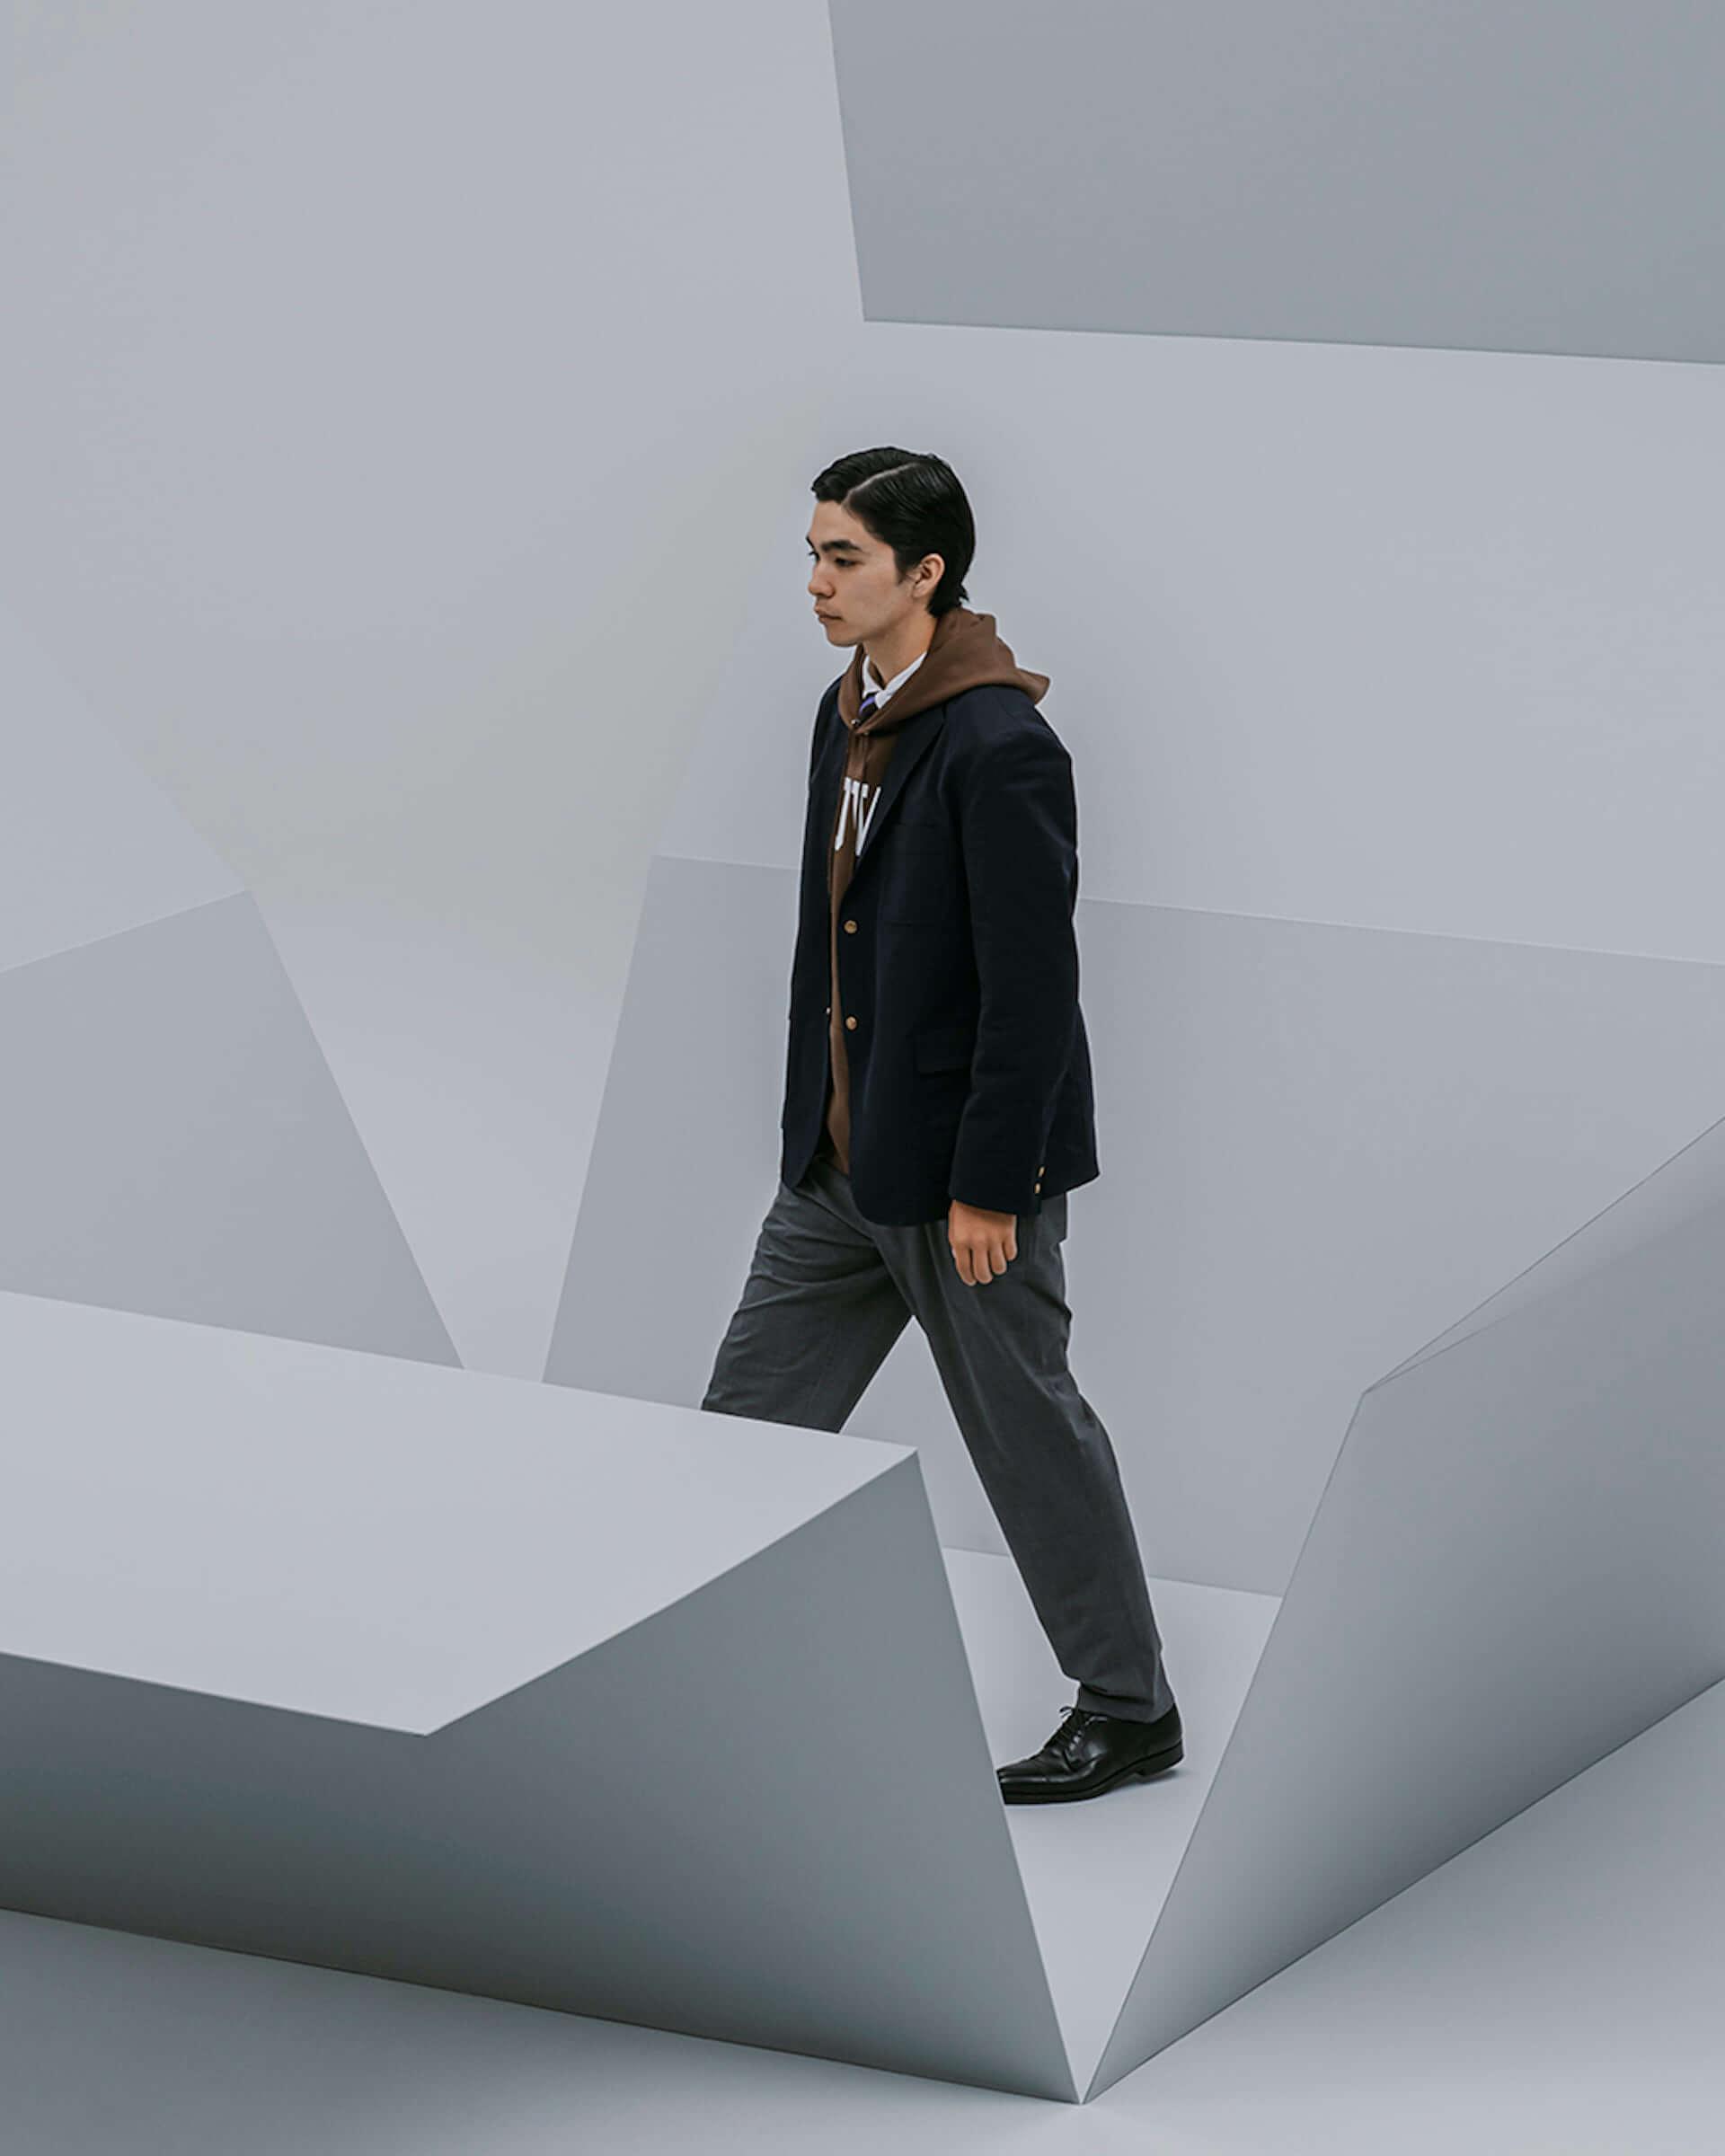 THE NORTH FACE日本橋店の2周年記念に別注コレクション「When the Dawning Brakes」が登場!「GORE-TEX SHAKEDRY」搭載のジャケットも lf201021_tnf-nihonbashi_6-1920x2400